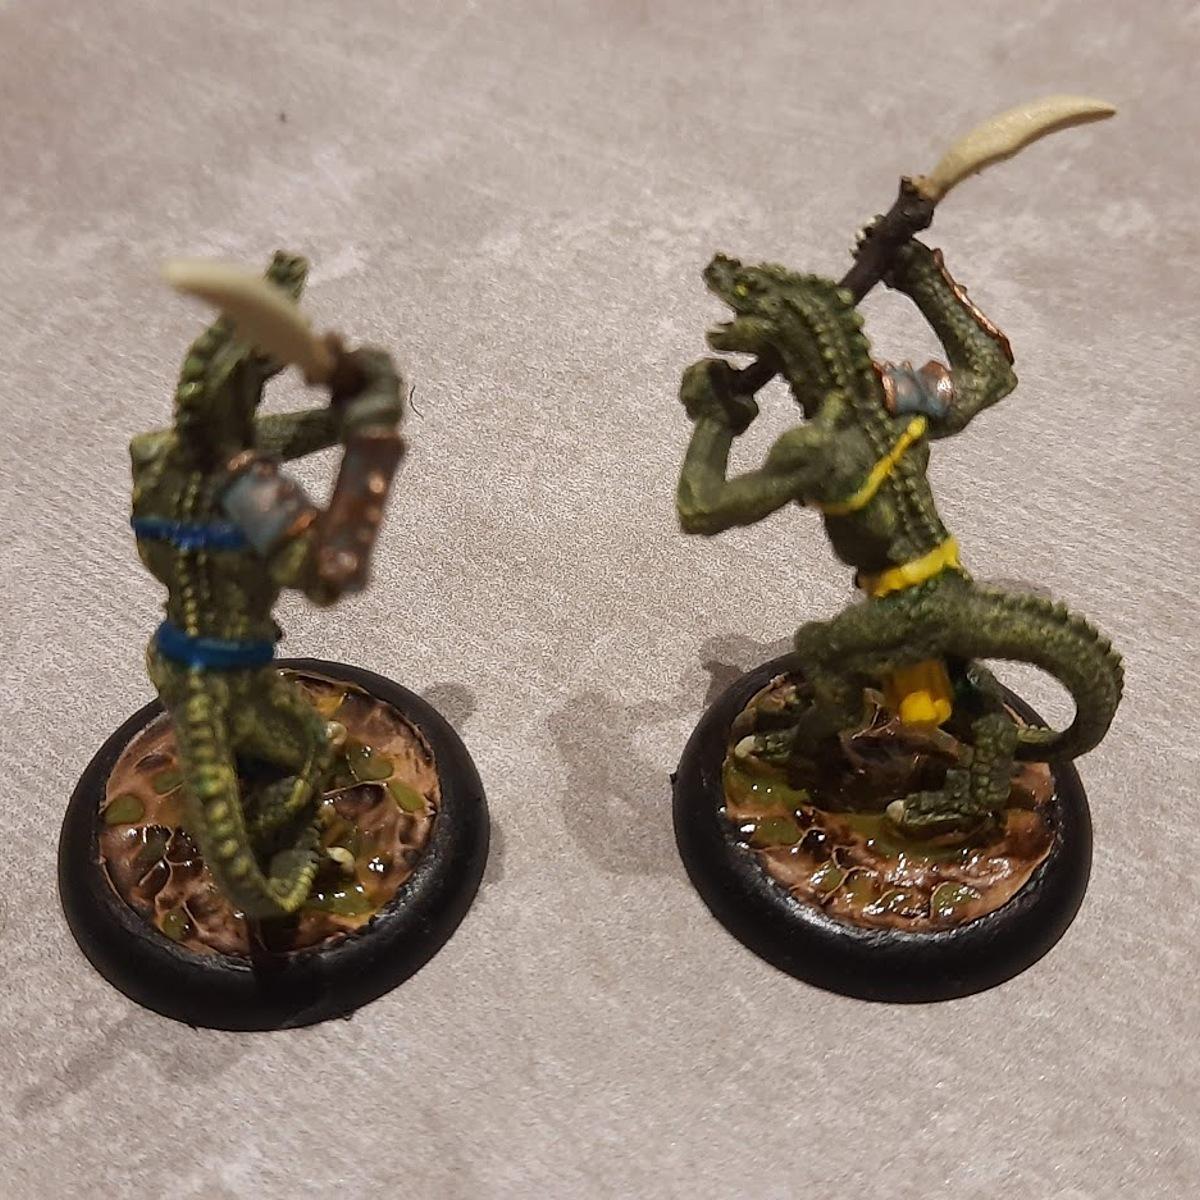 Swamp/Toxic Bases